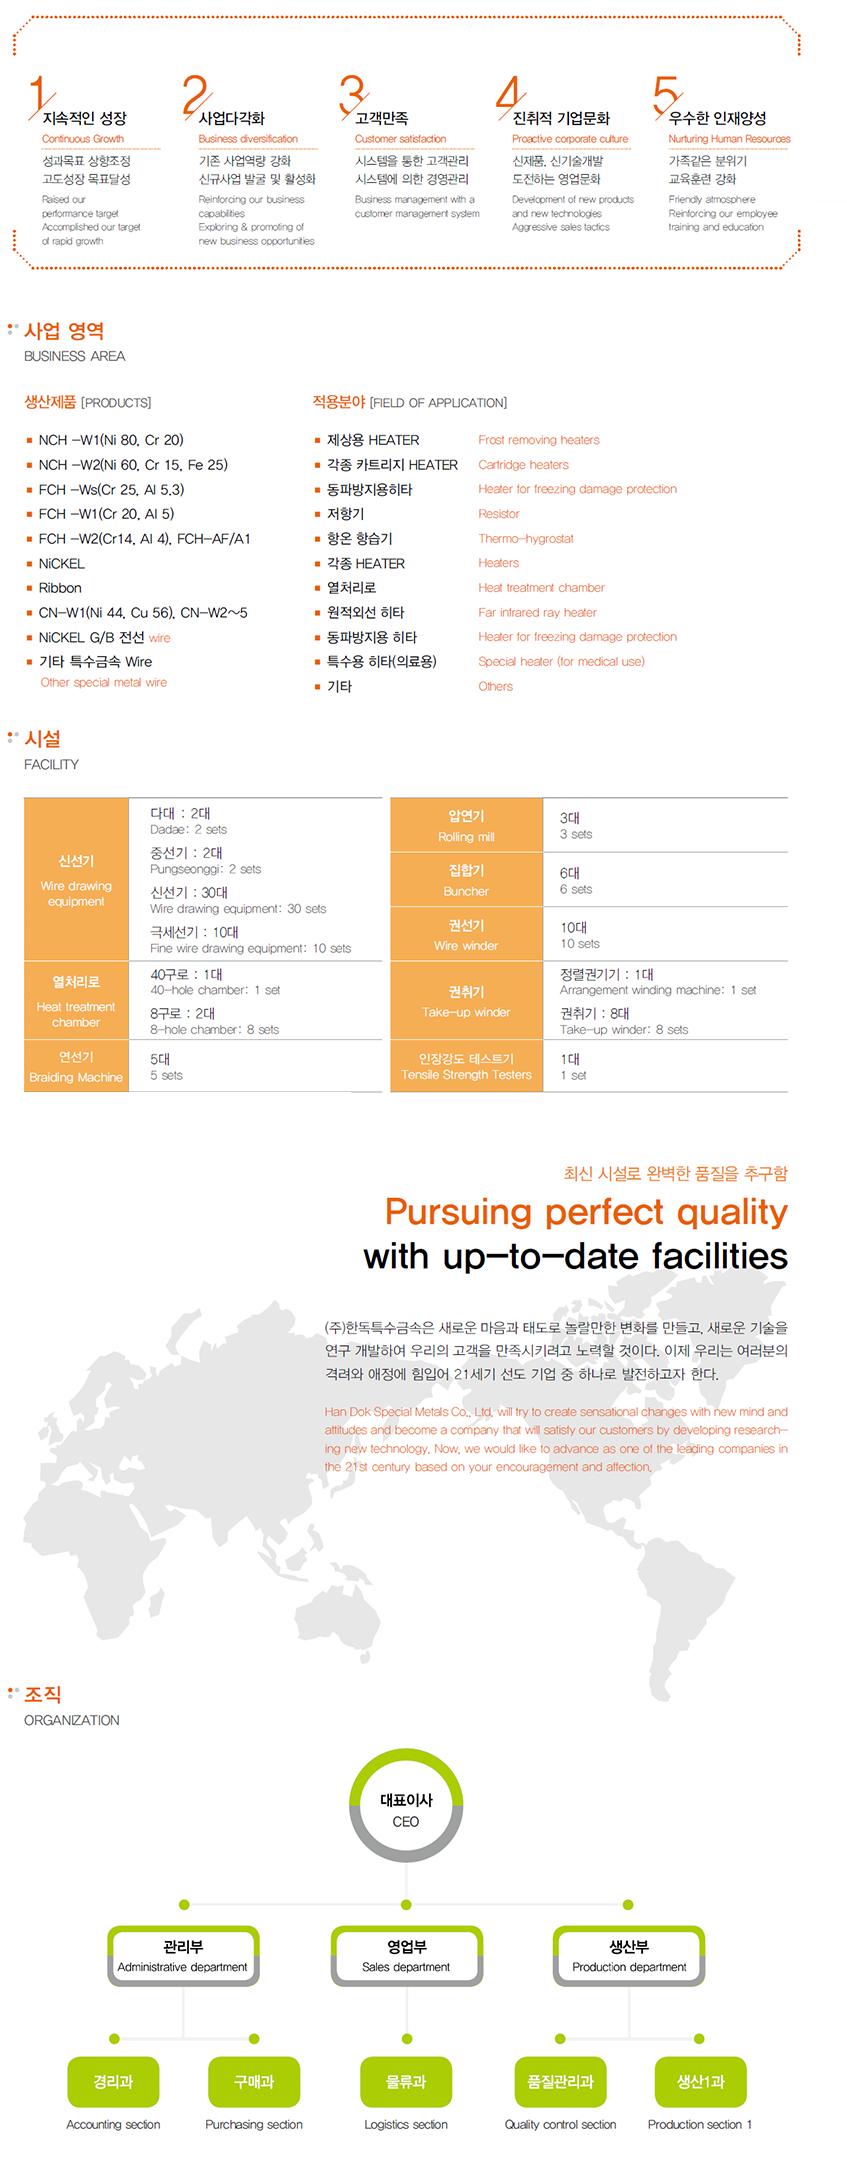 Han Dok Special Metals Business Area